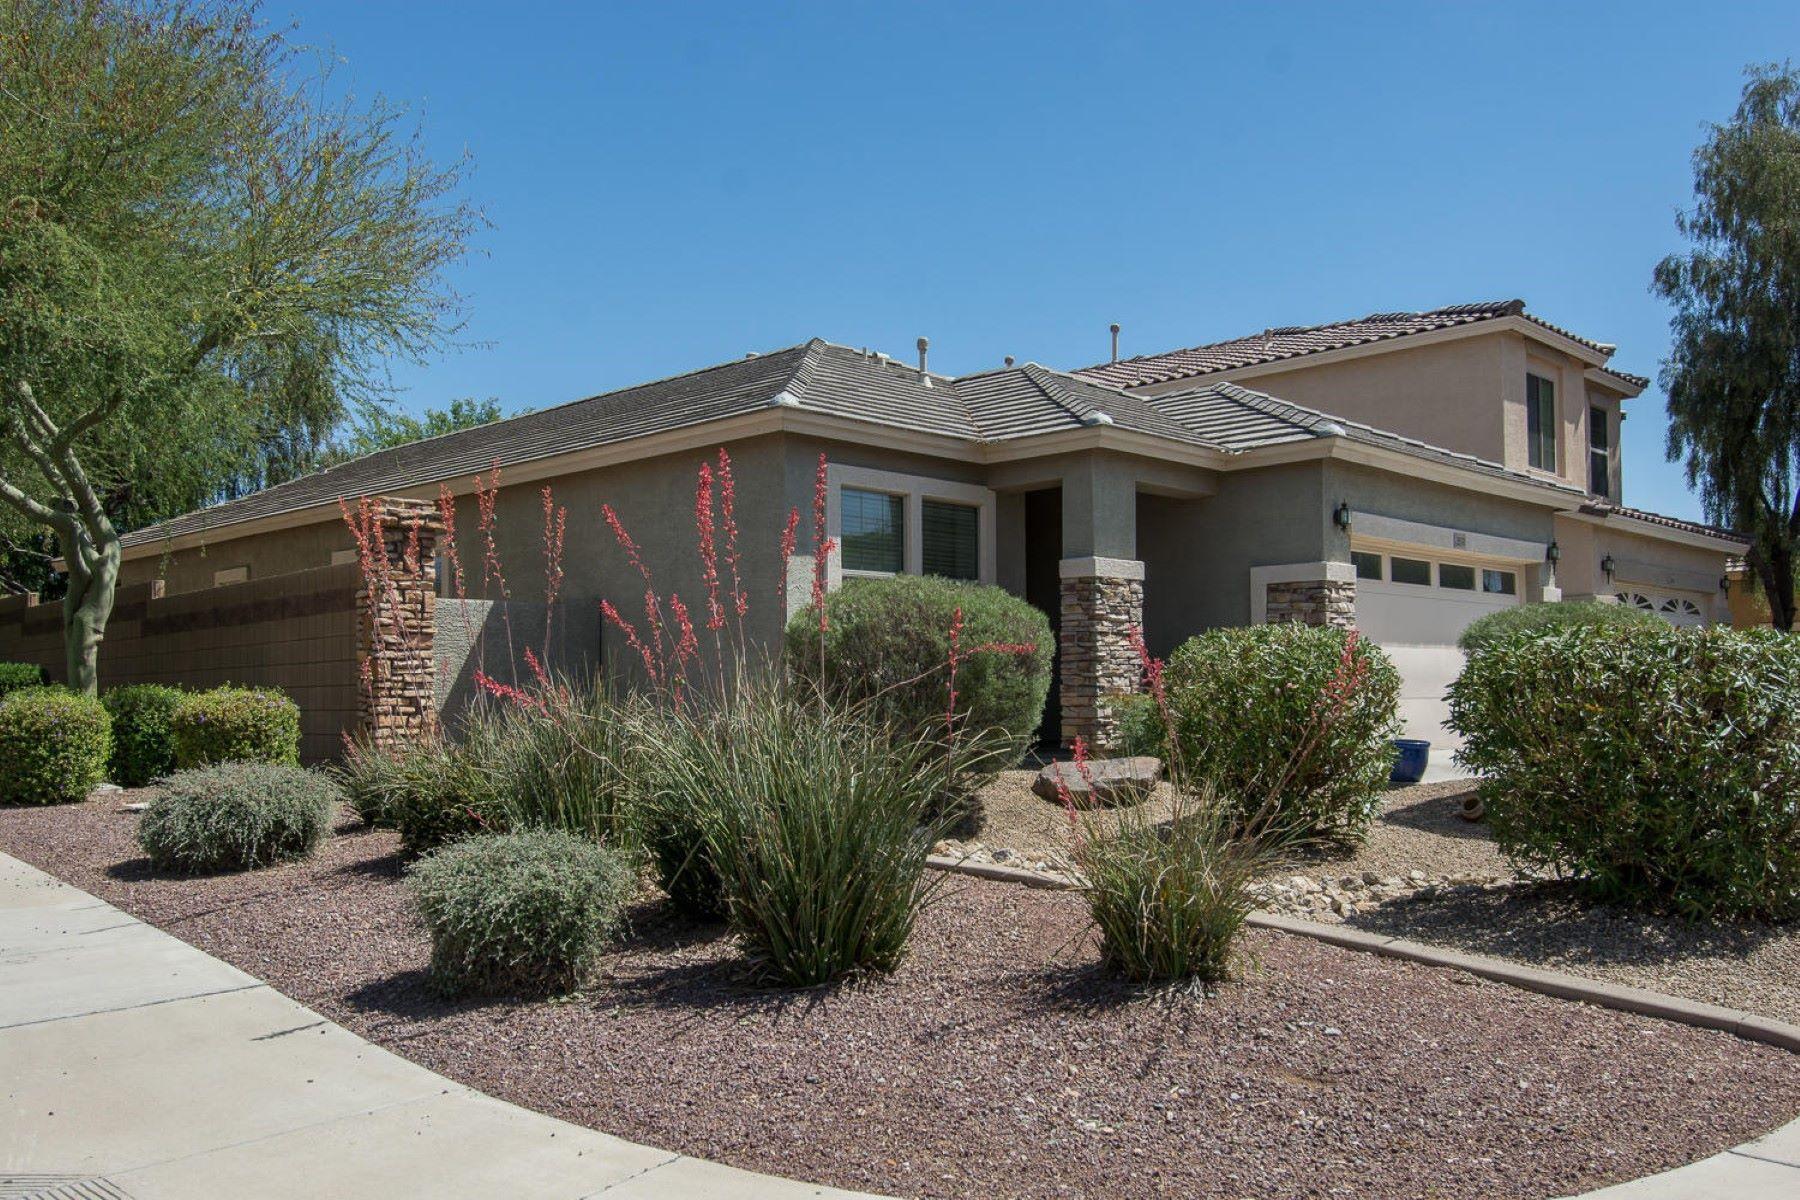 Single Family Home for Sale at Fantastic Phoenix Home 2570 W Granite Pass Rd Phoenix, Arizona, 85085 United States